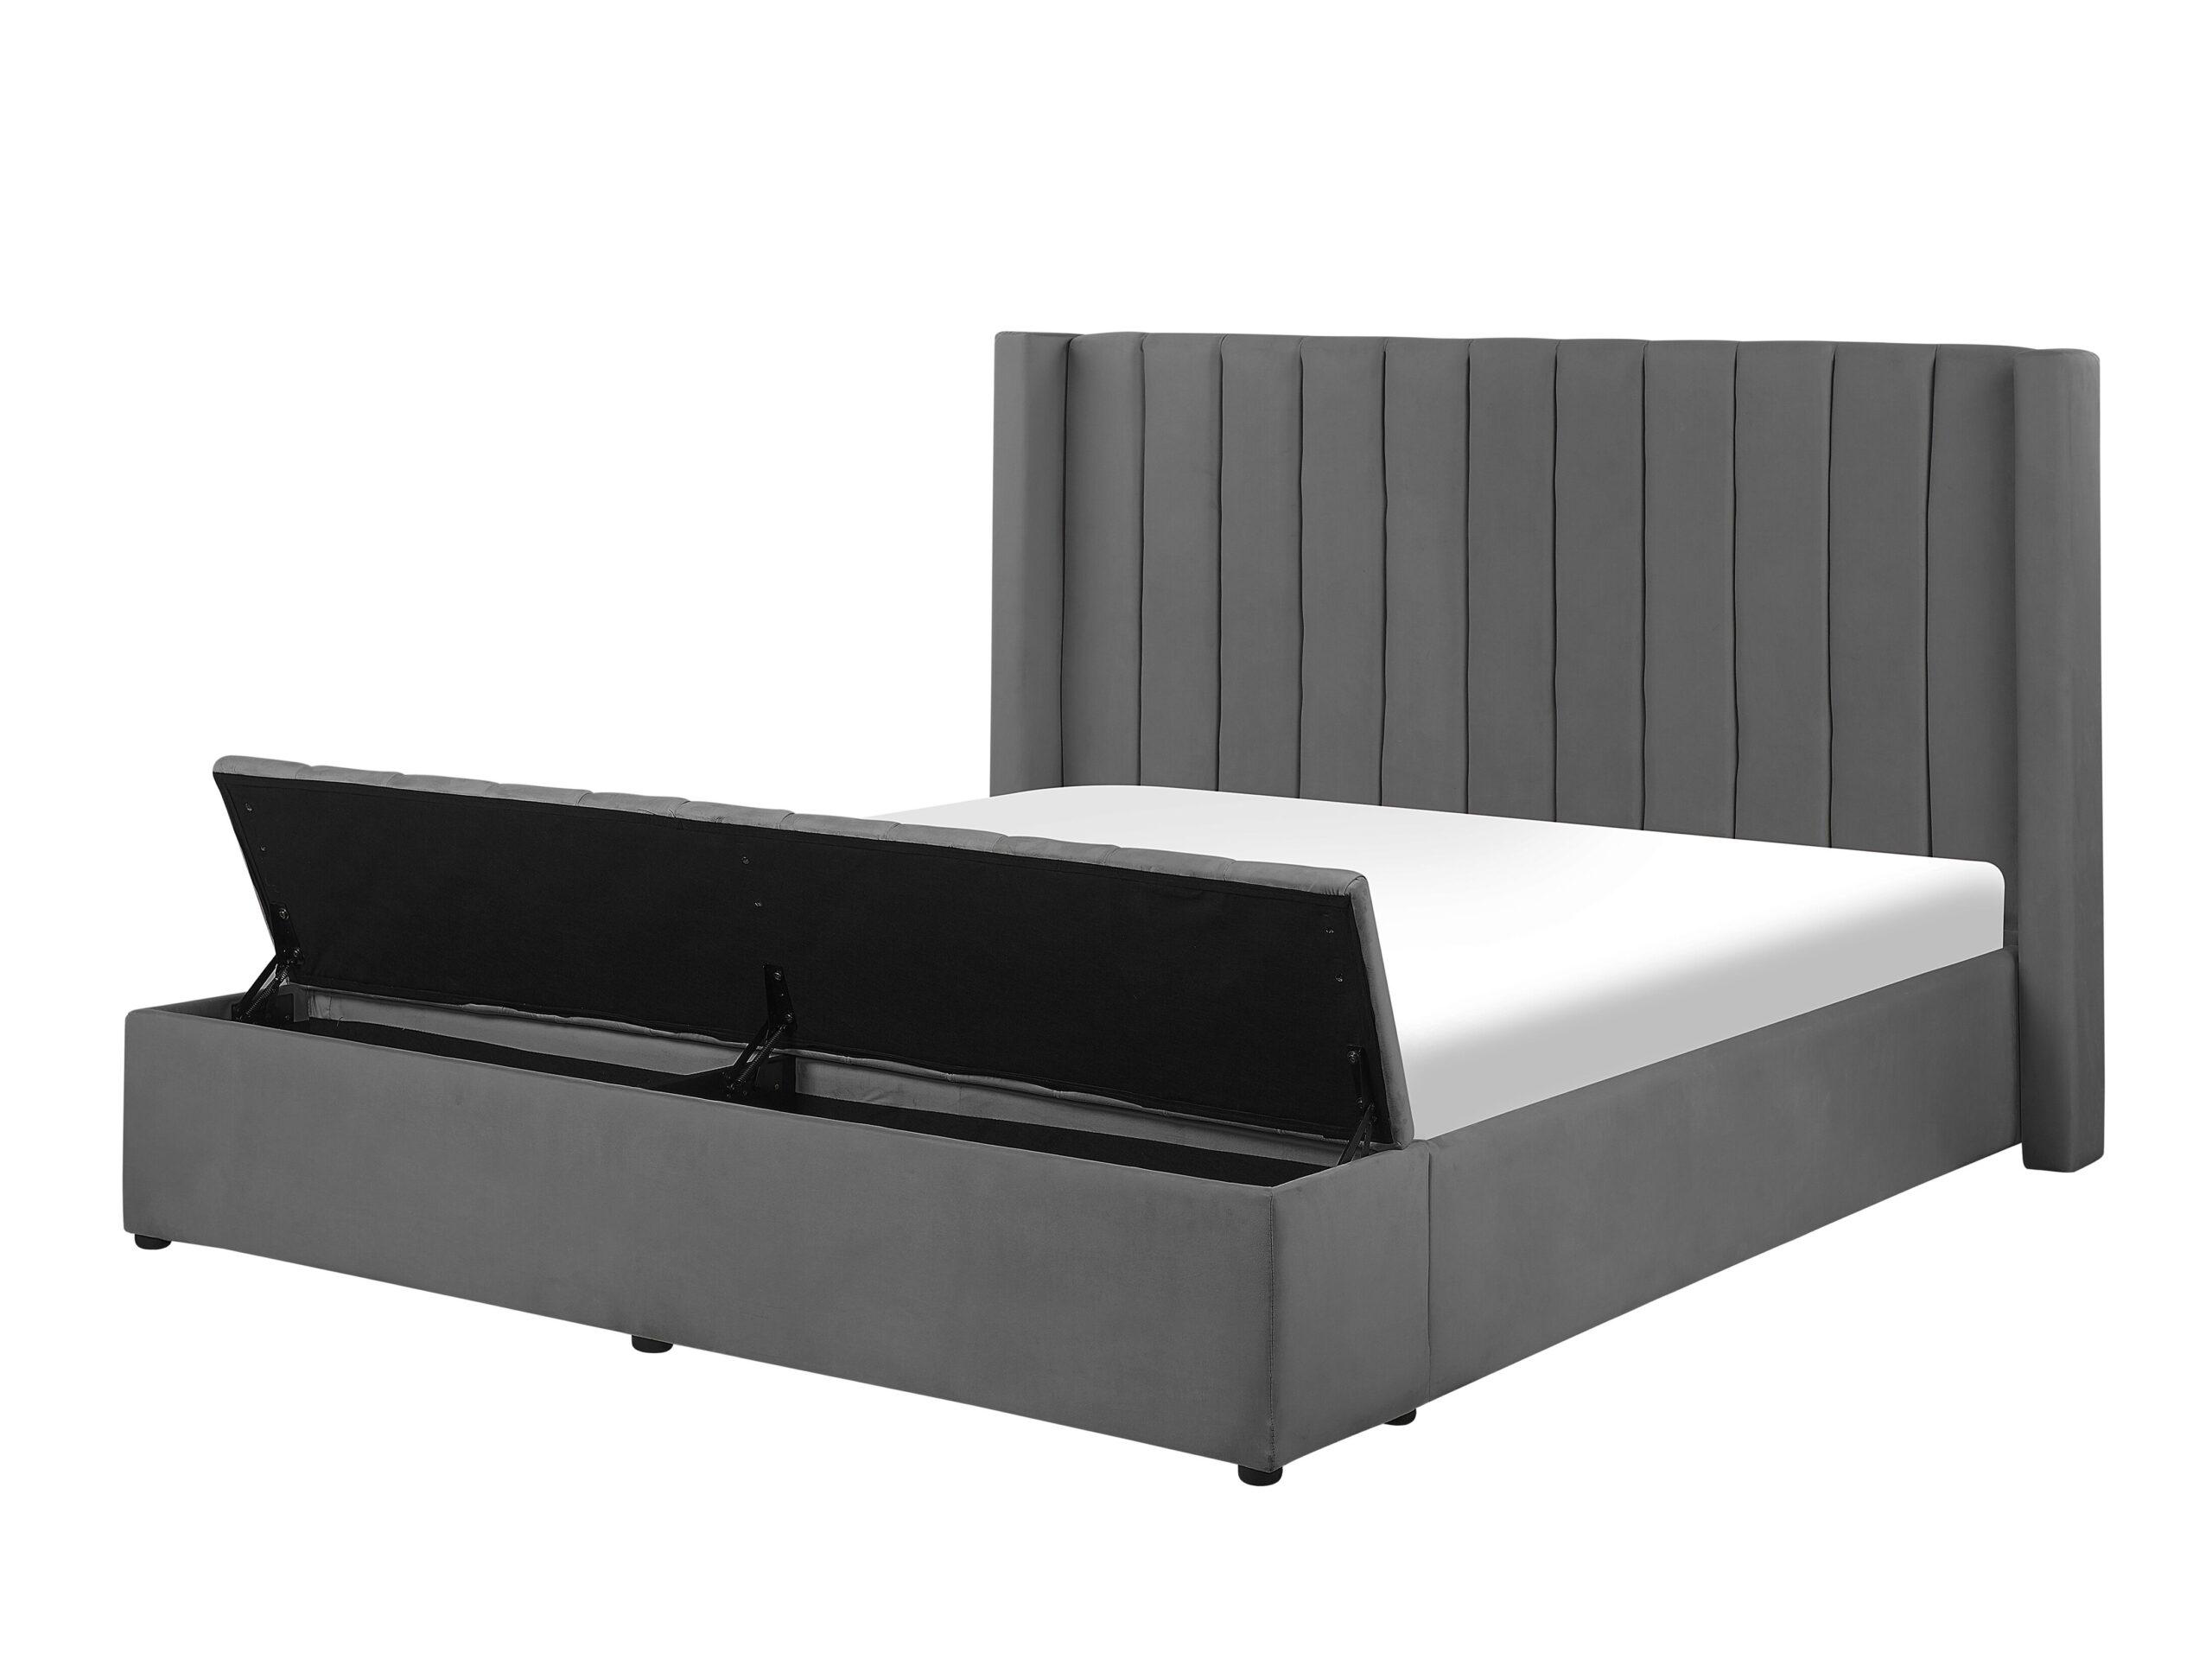 Full Size of Polsterbett 200x220 Samtstoff Grau Mit Stauraum 180 200 Cm Noyers Bett Betten Wohnzimmer Polsterbett 200x220